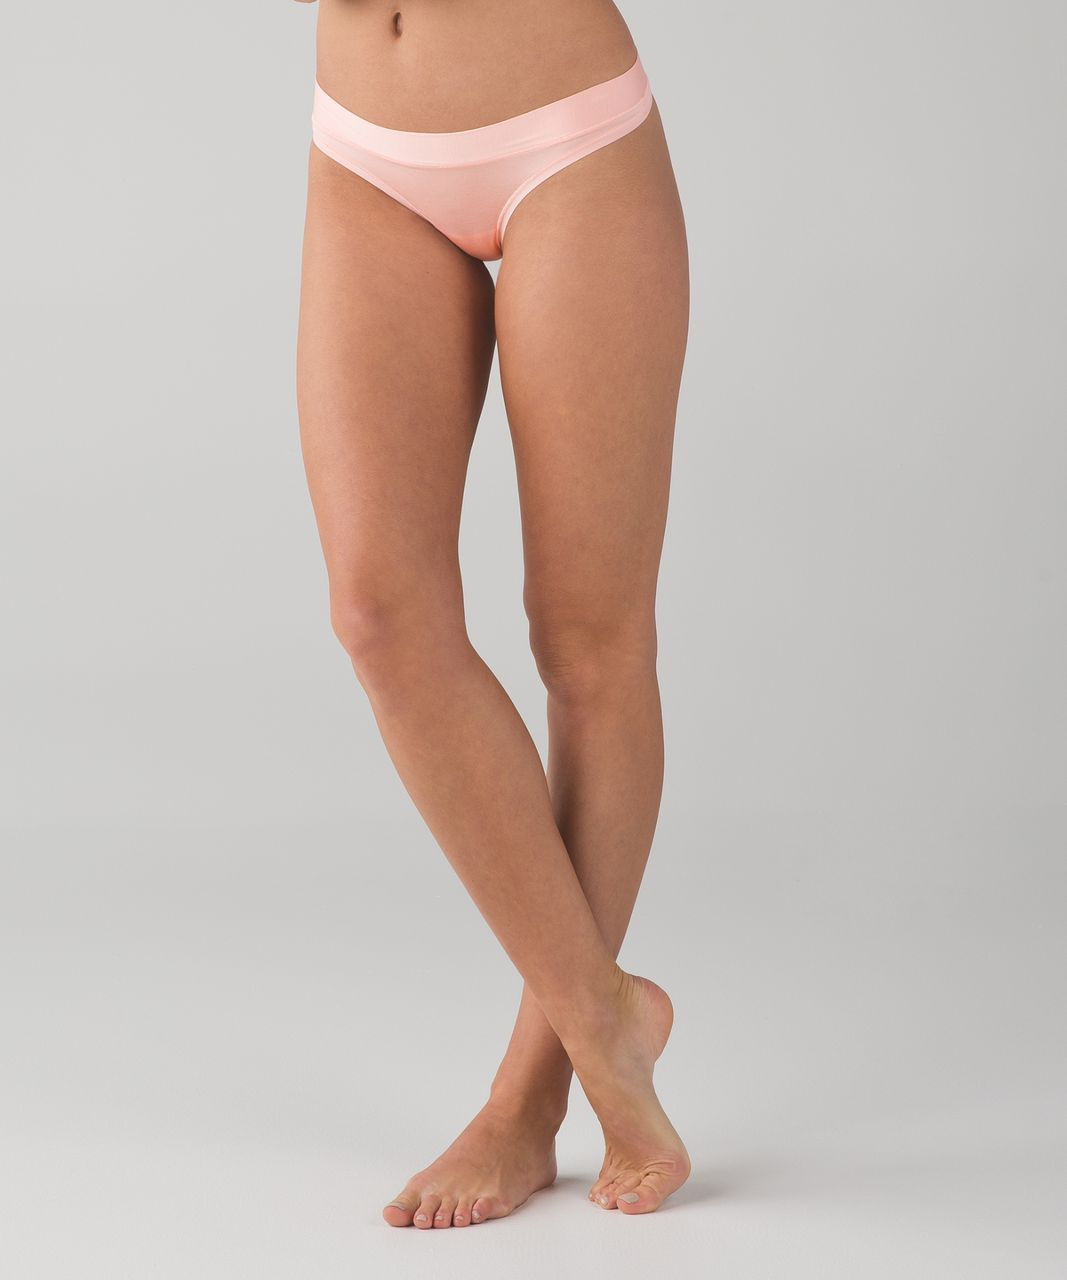 Lululemon Mula Bandhawear Thong - Minty Pink